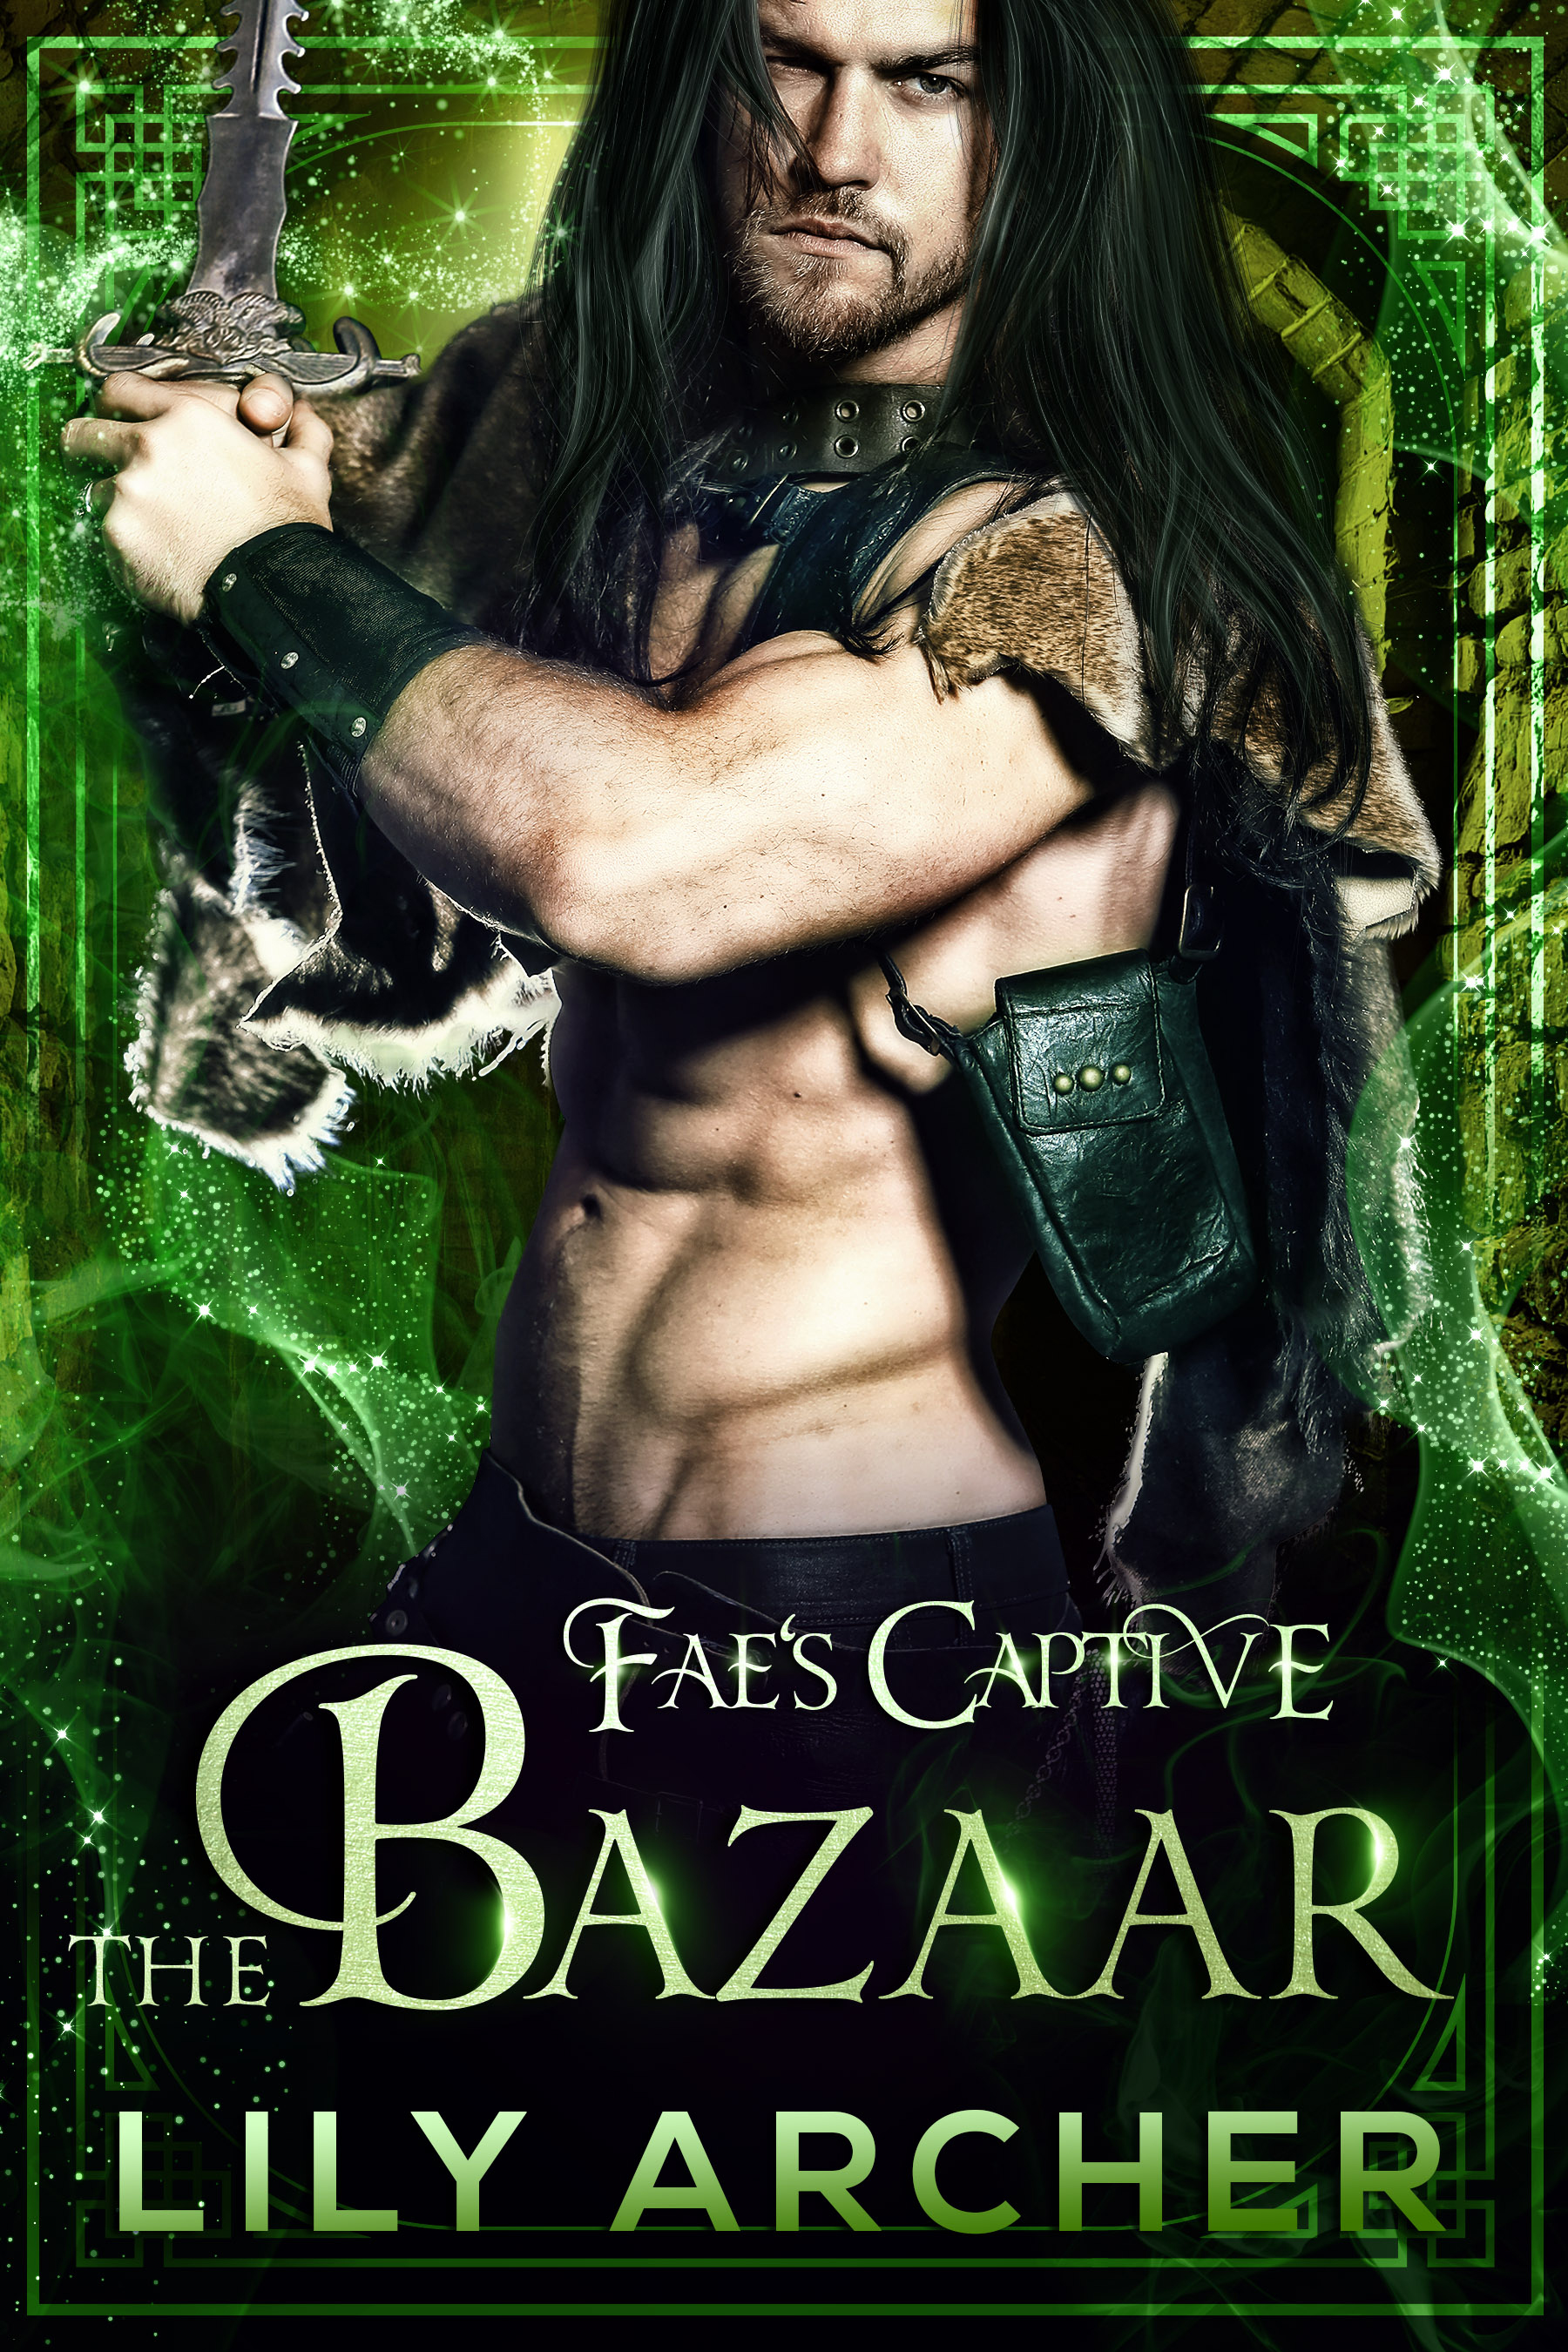 THE BAZAAR - FAE'S CAPTIVE